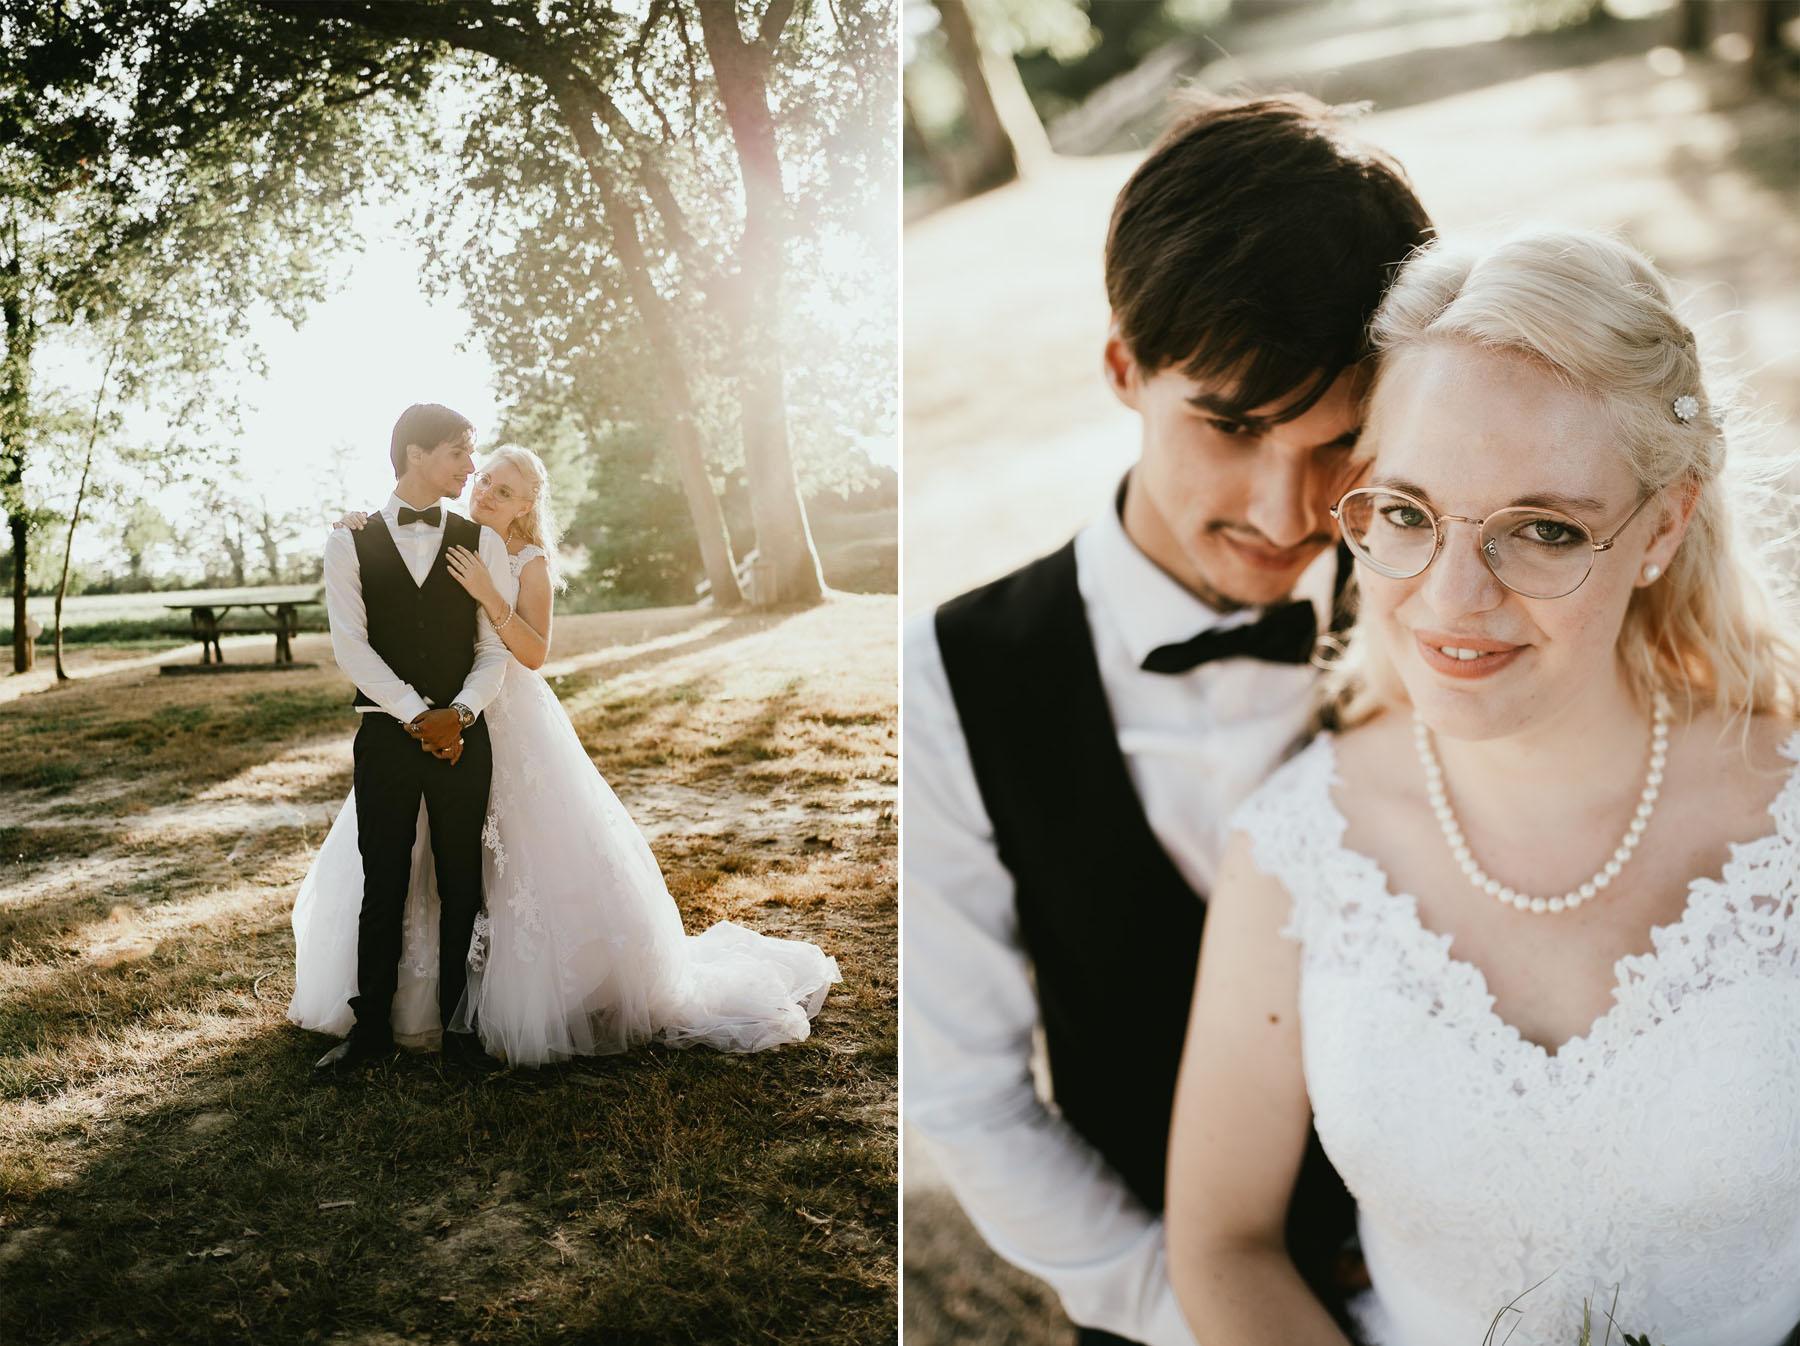 Photographe de mariage moody boho chic boheme dax landes aquitaine fineart ff 1